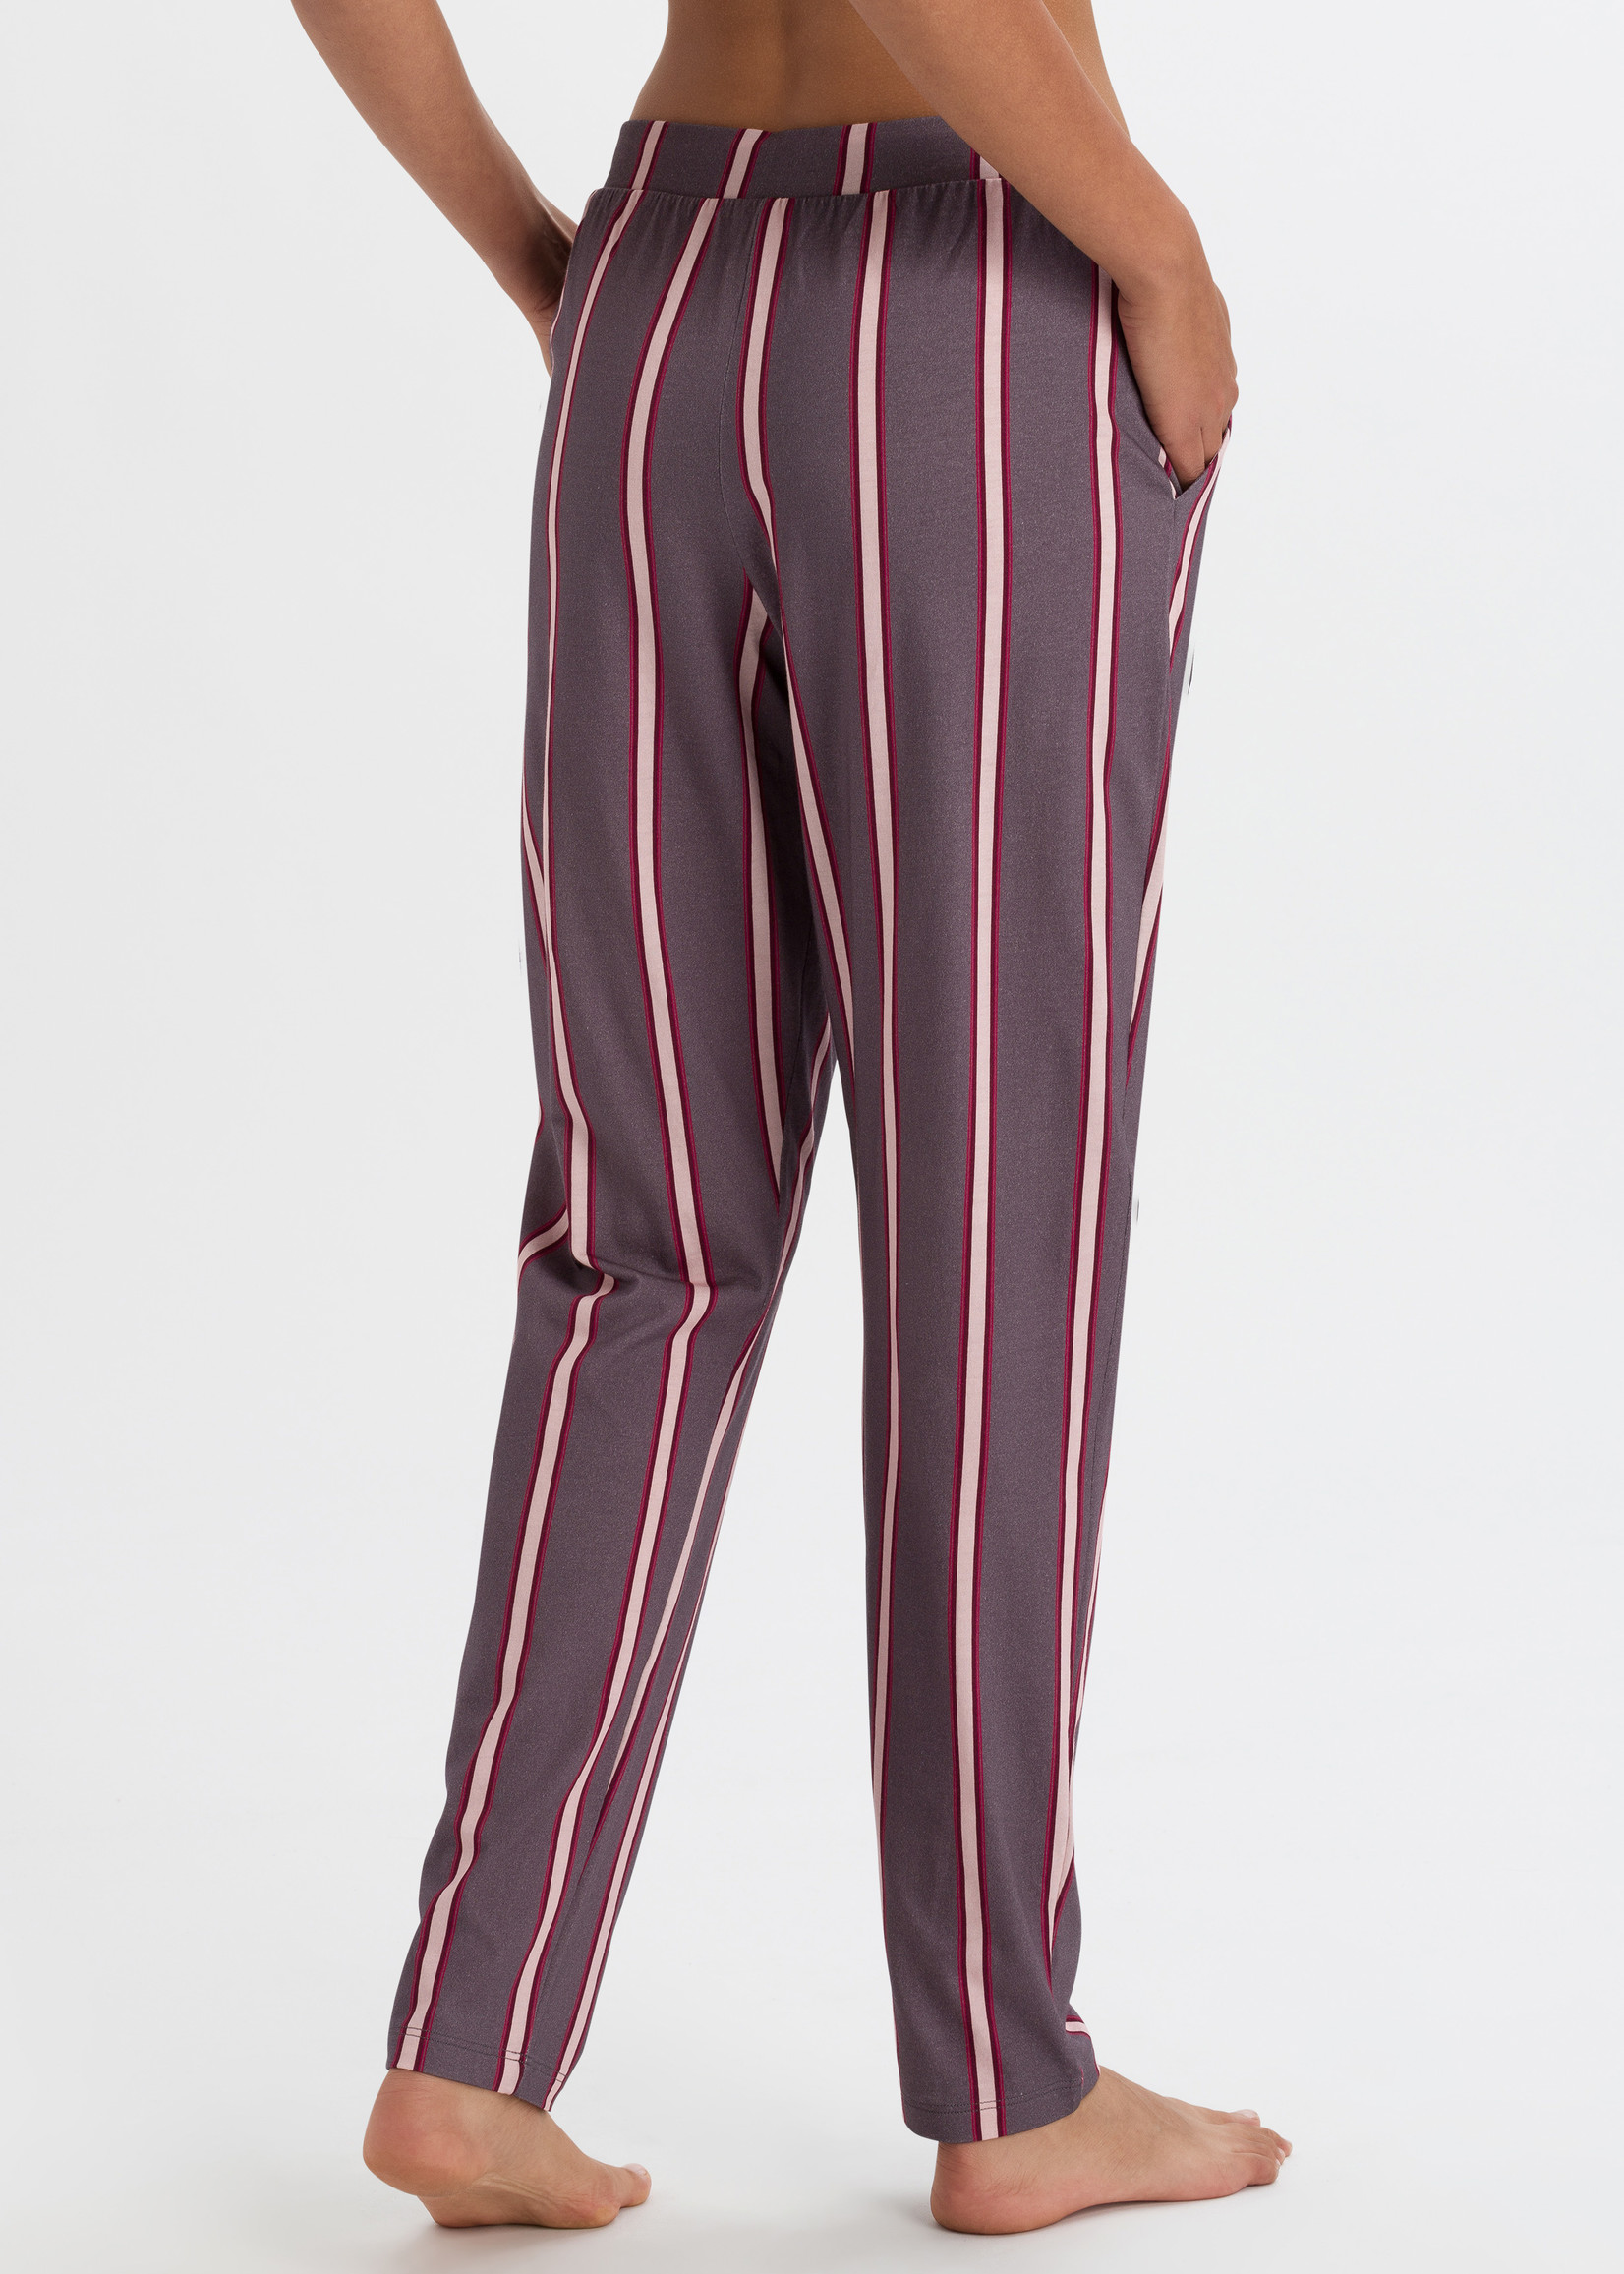 Hanro Sleep & Lounge Stripe PJ